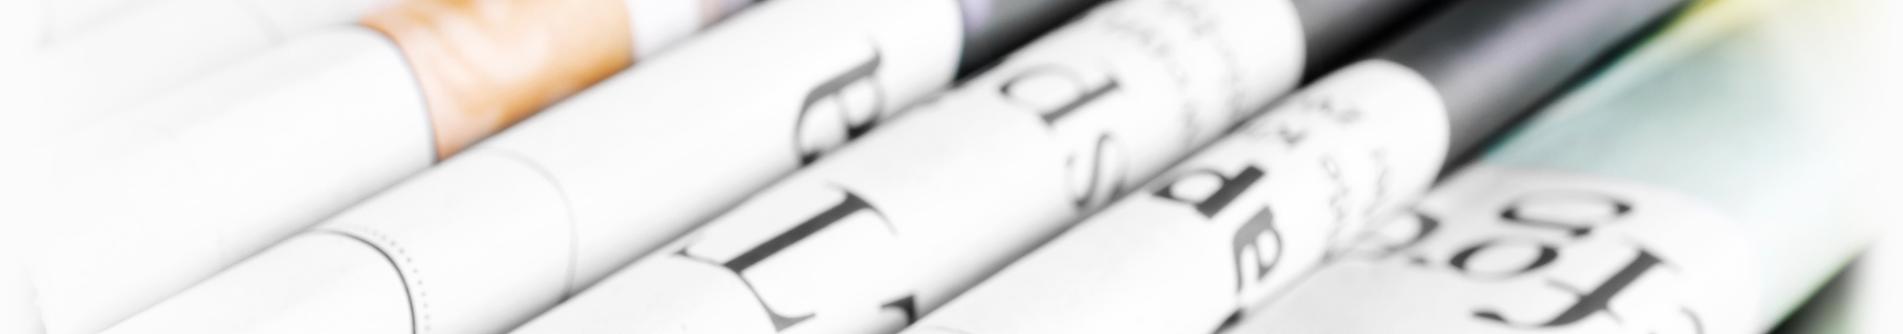 Provaria Presse Softwarelösungen MS Dynamics SharePoint Azure Office 365